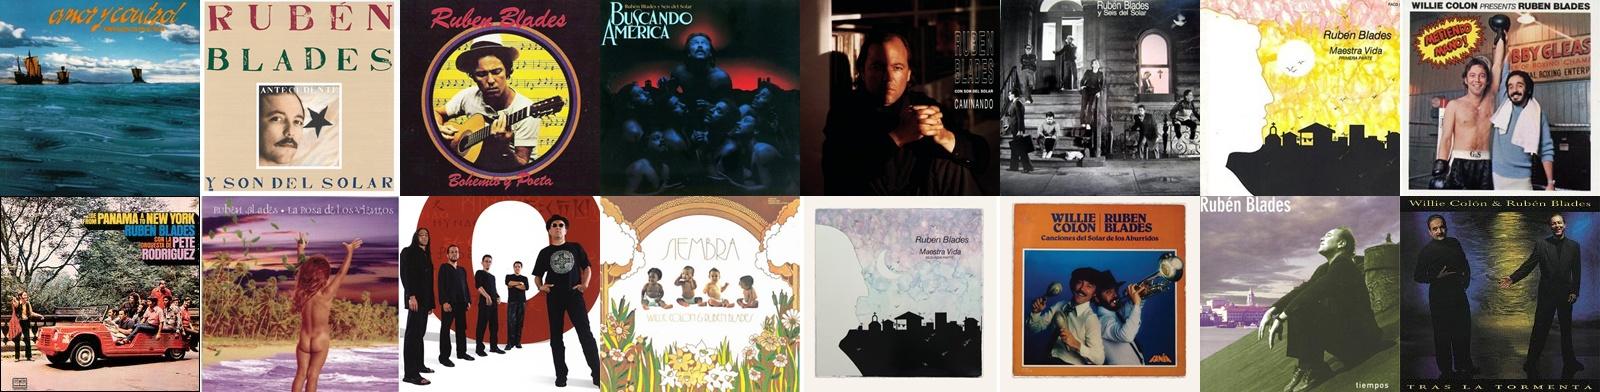 RubenAlbums-Collage